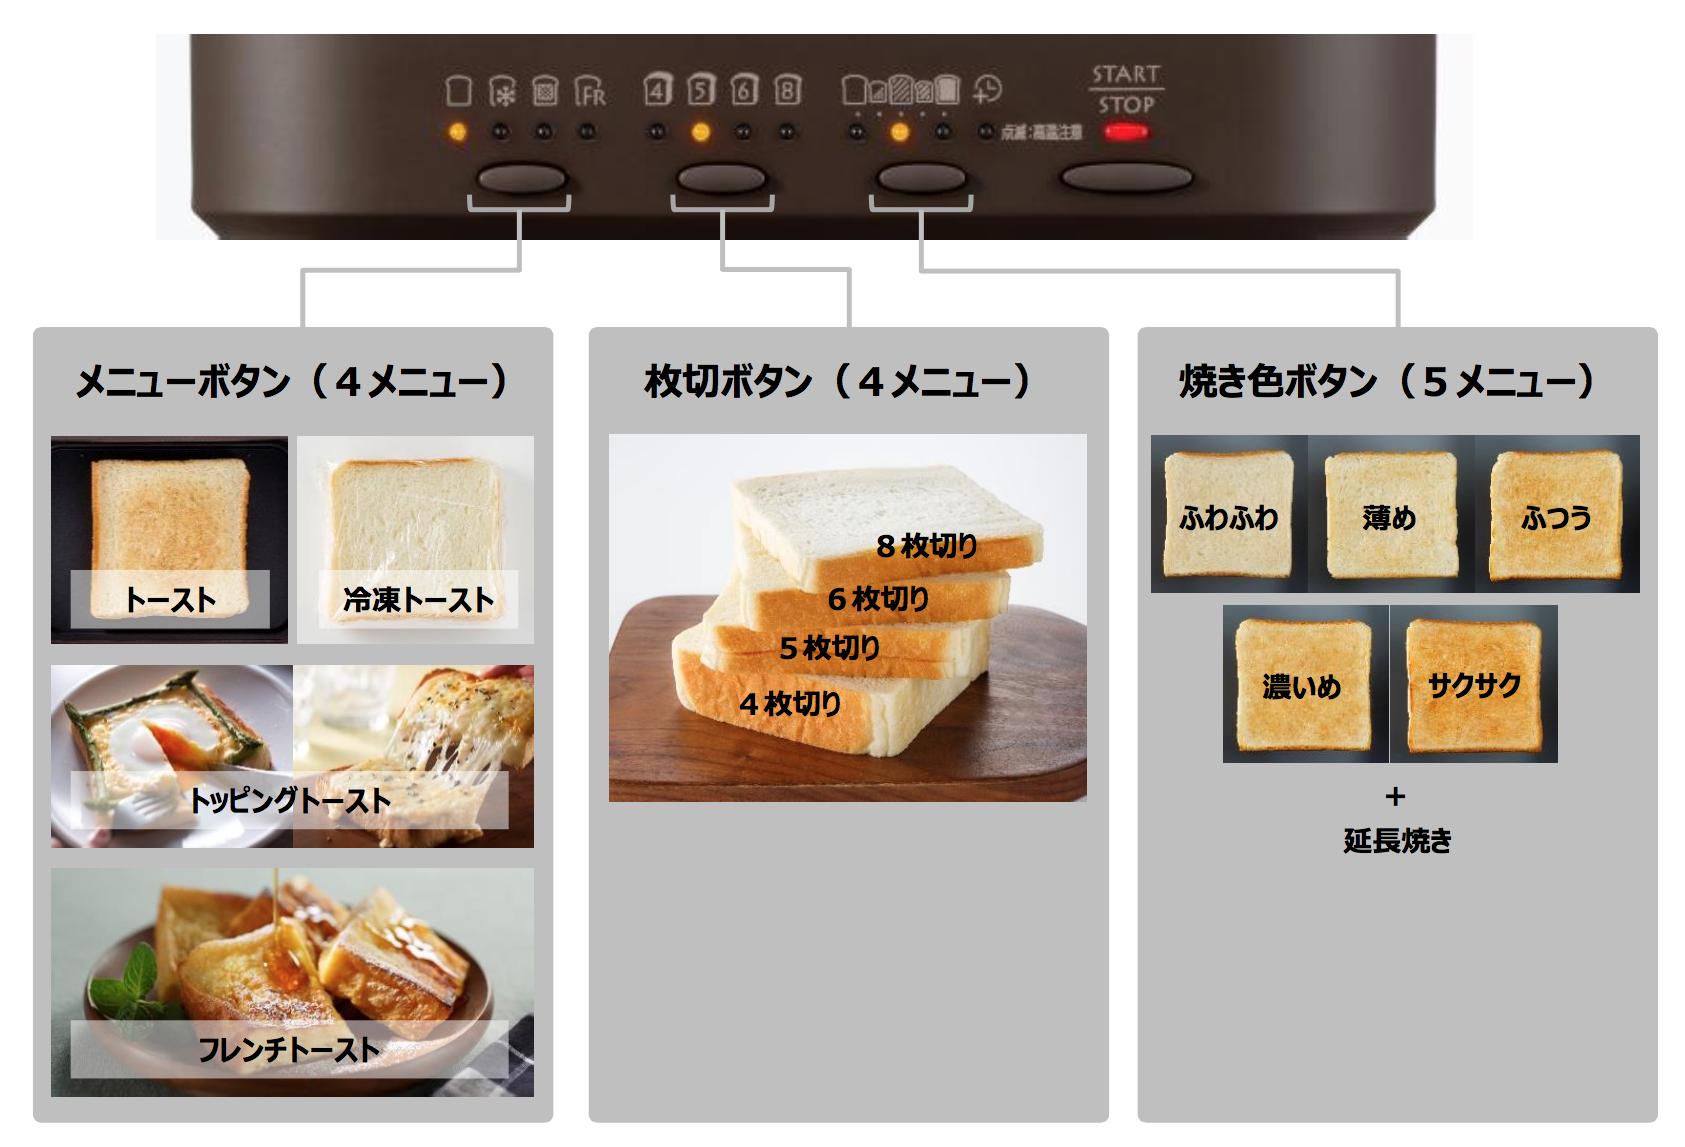 Risultati immagini per 三菱ブレッドオーブン